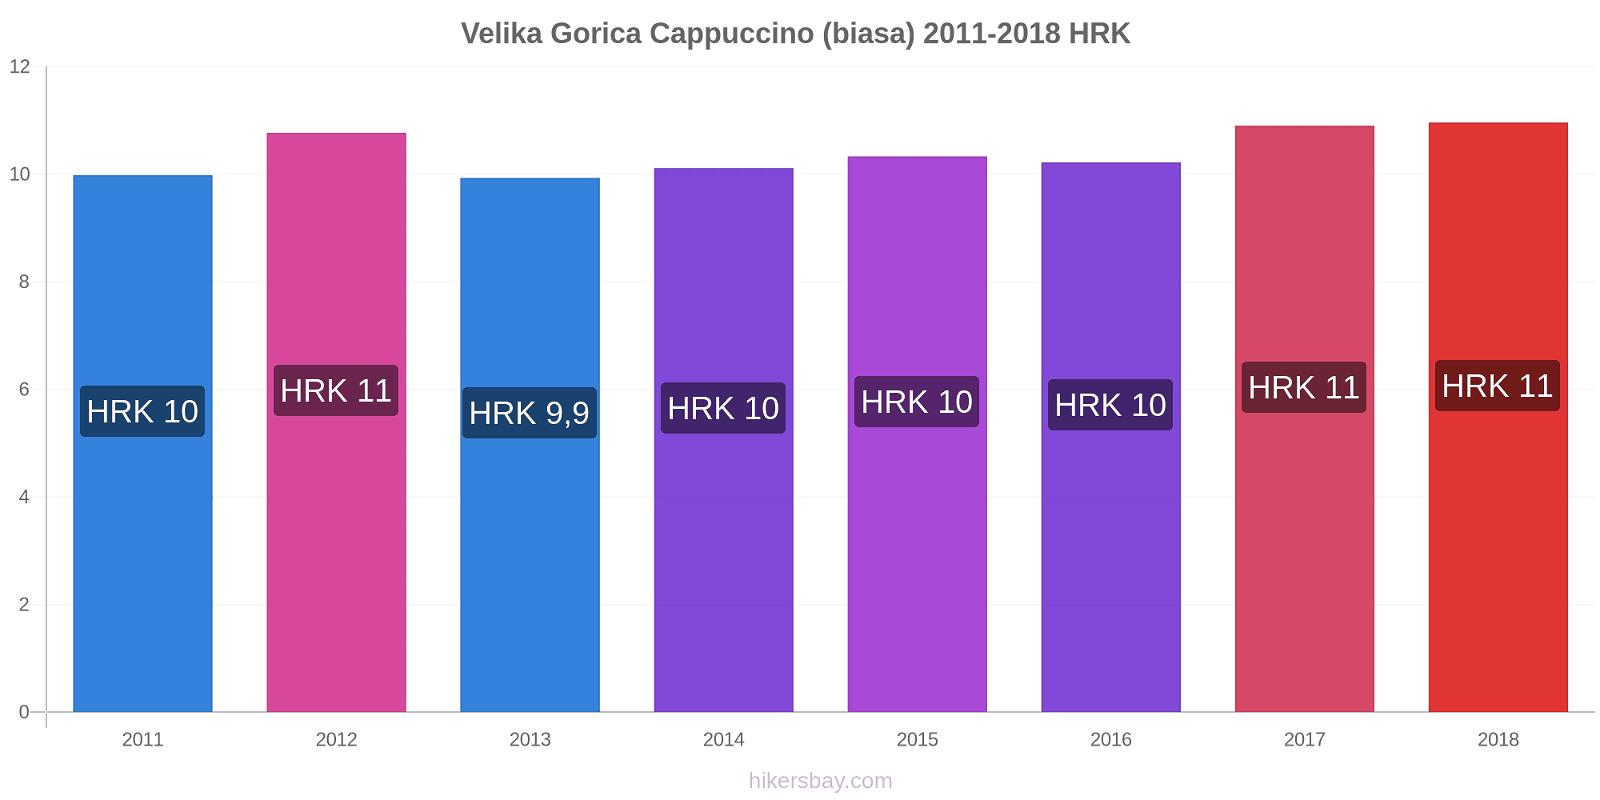 Velika Gorica perubahan harga Cappuccino (biasa) hikersbay.com